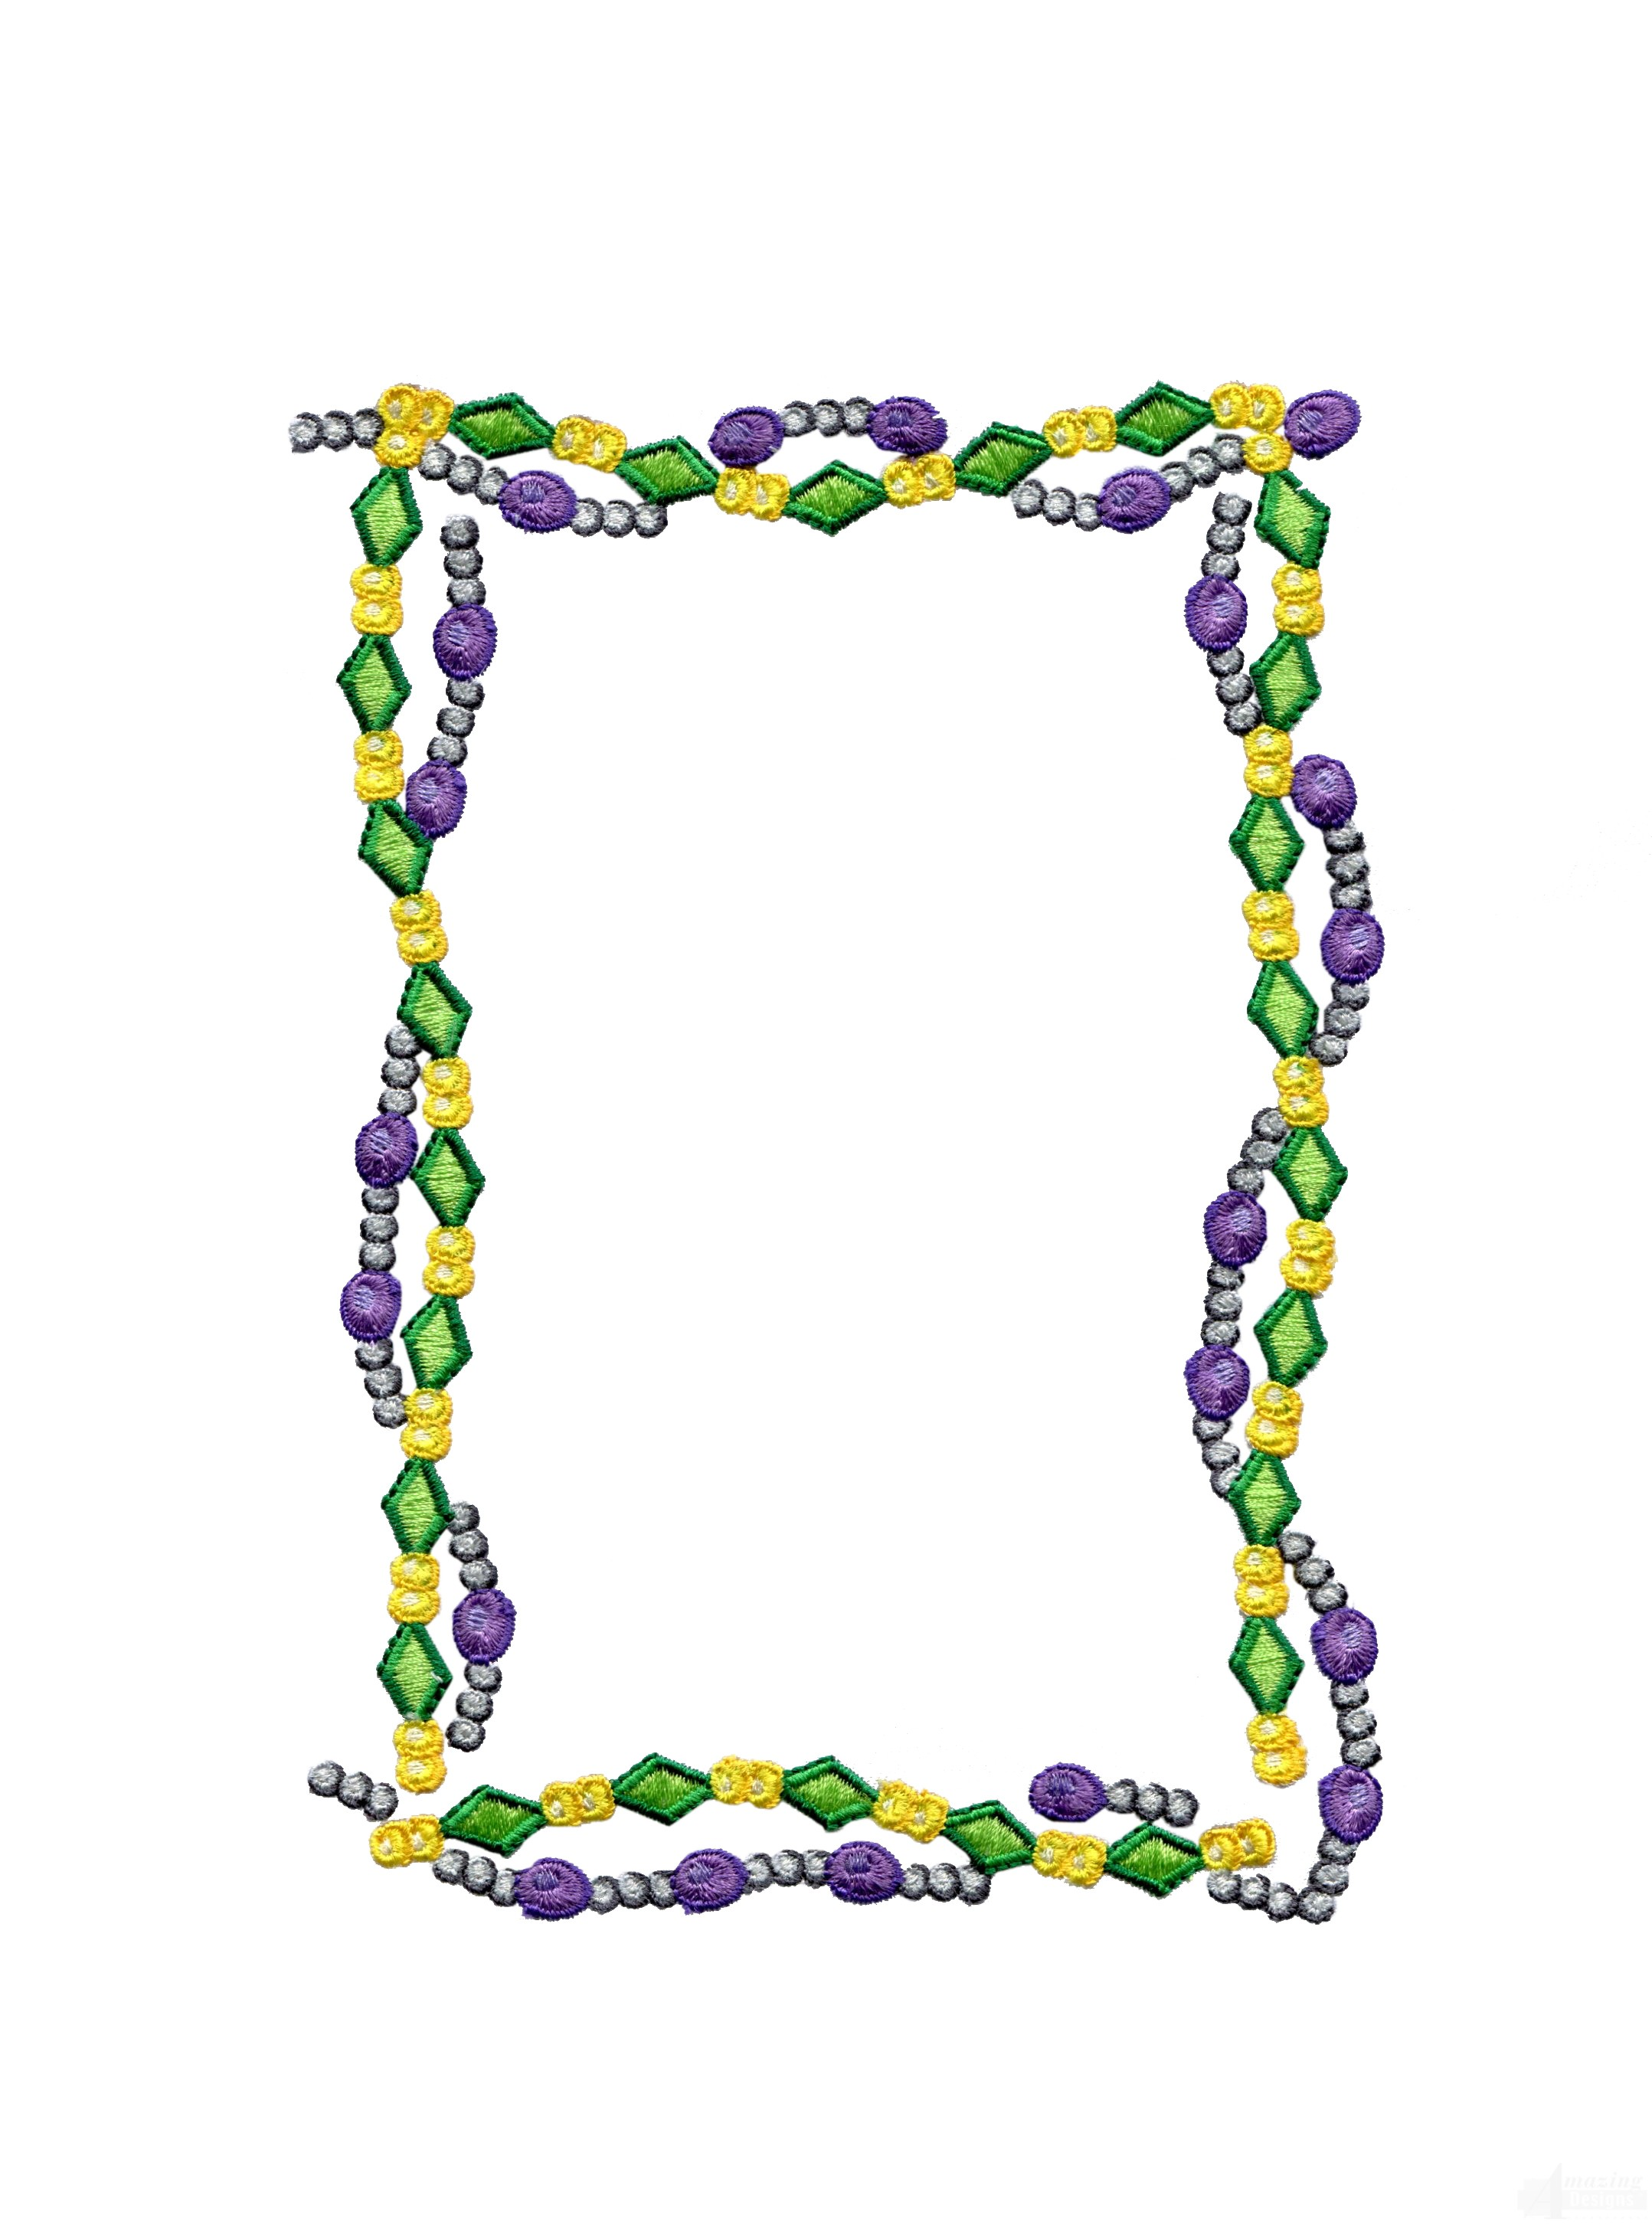 Mardi Gras Clip Art Borders